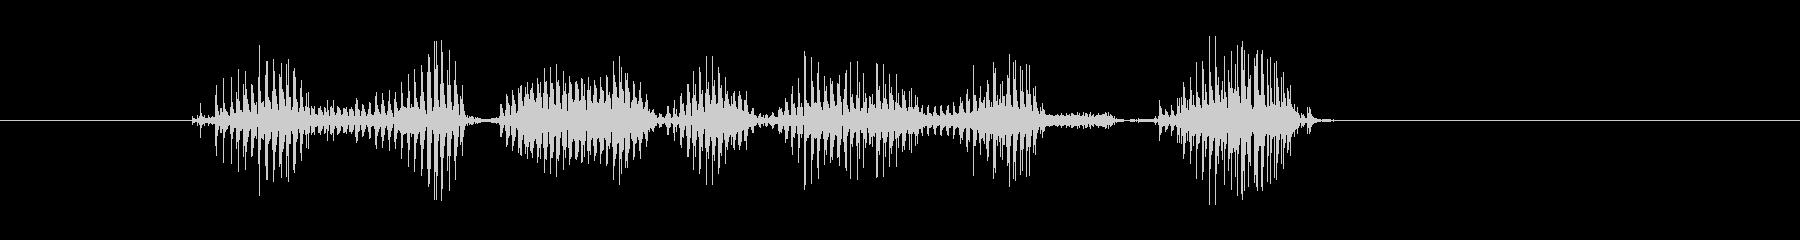 Thank you (robot)'s unreproduced waveform